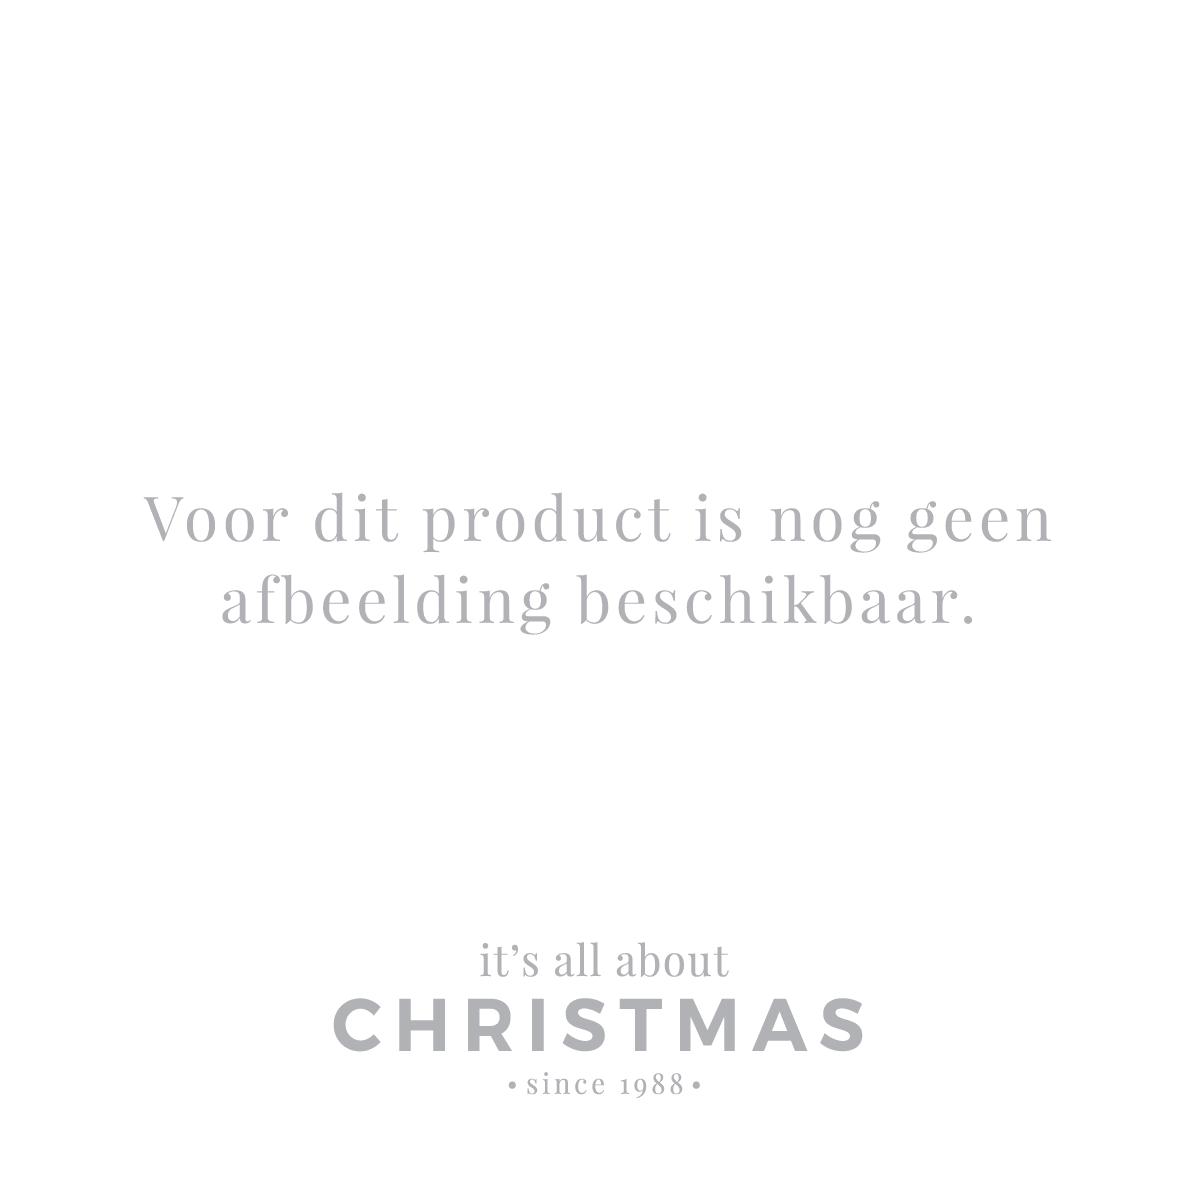 Lamettagirlande rosa glänzend, 270x15 cm